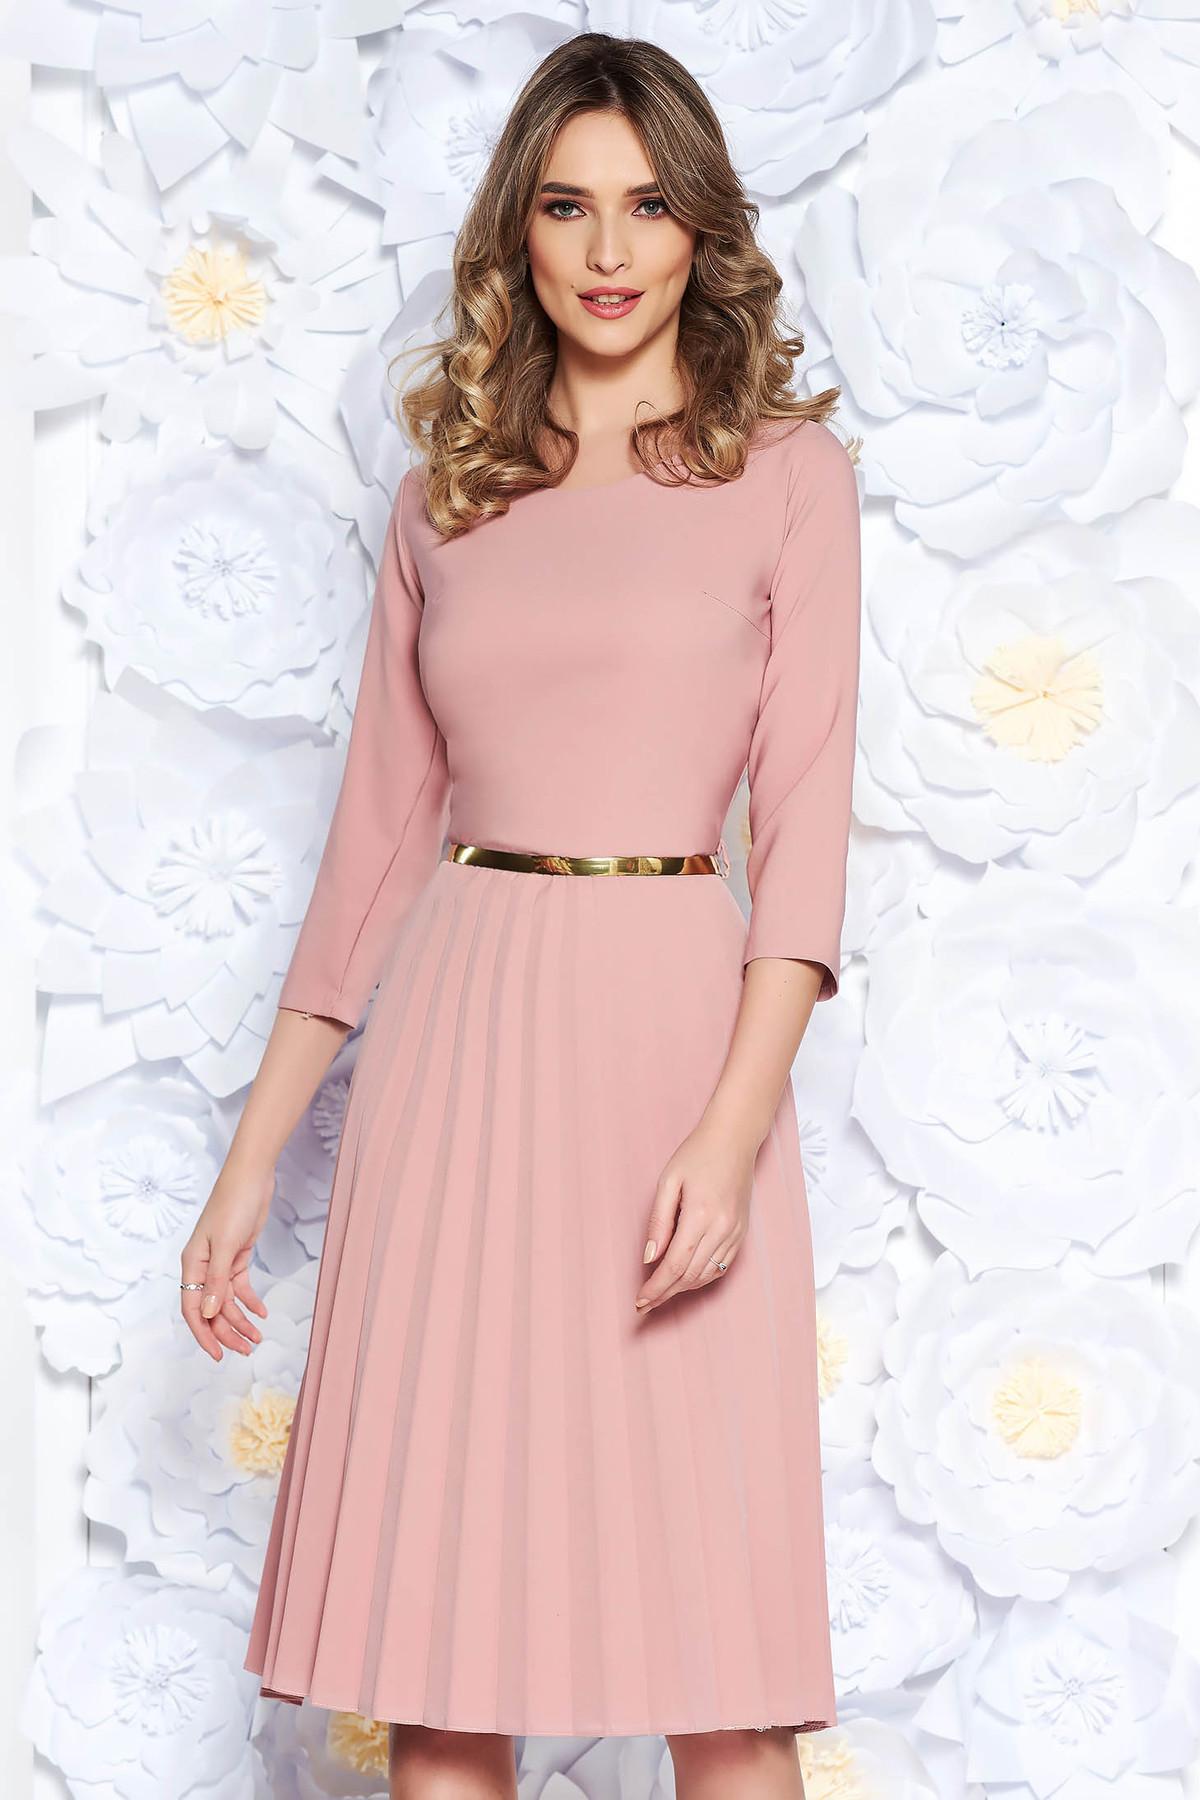 Rochie rosa eleganta in clos plisata din stofa elastica subtire cu accesoriu tip curea